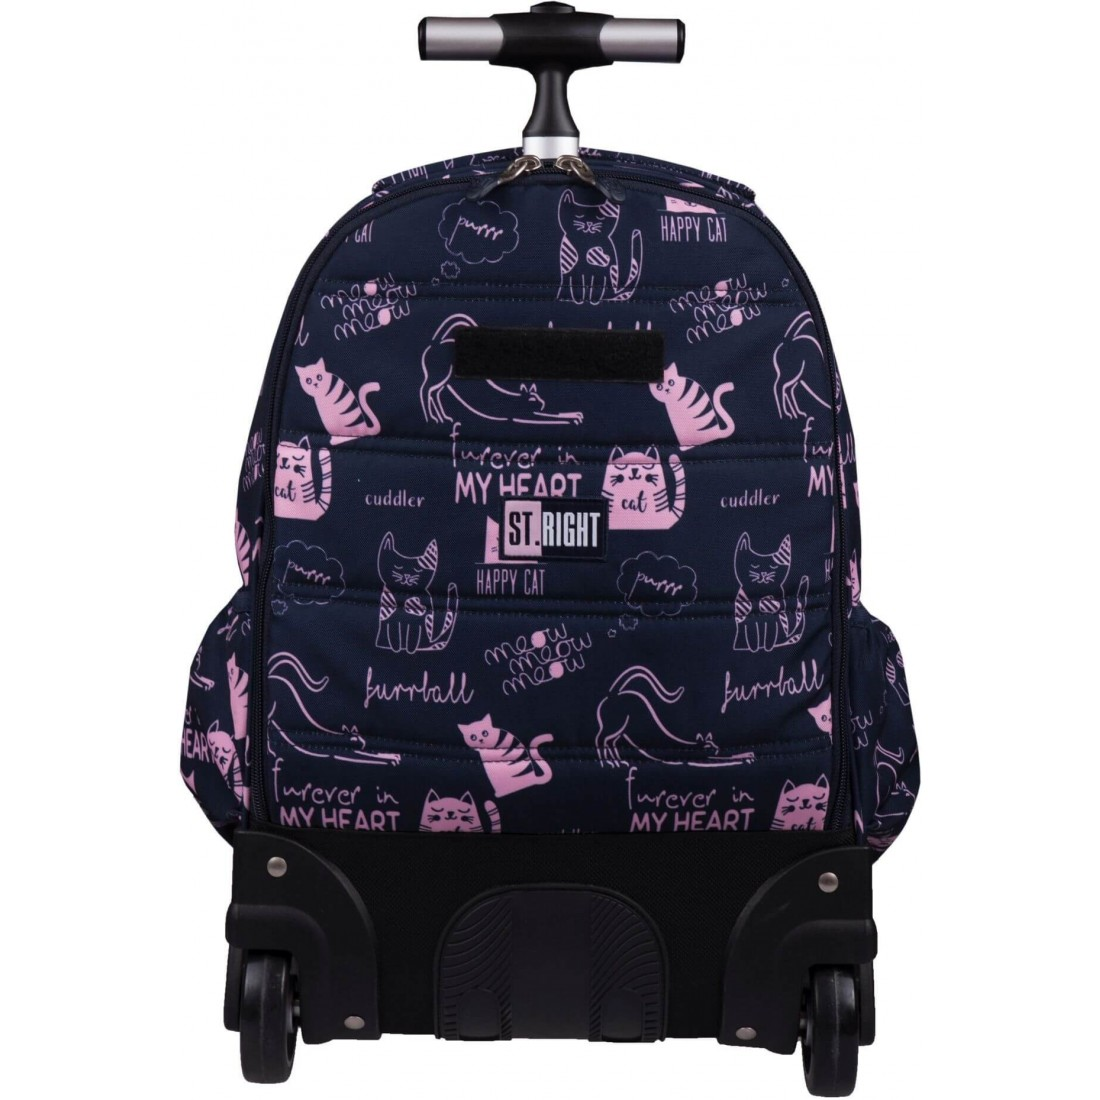 Plecak na kółkach dla dzieci granatowo-różowy koty ST.RIGHT CATS St.Majewski TB01 - plecak-tornister.pl